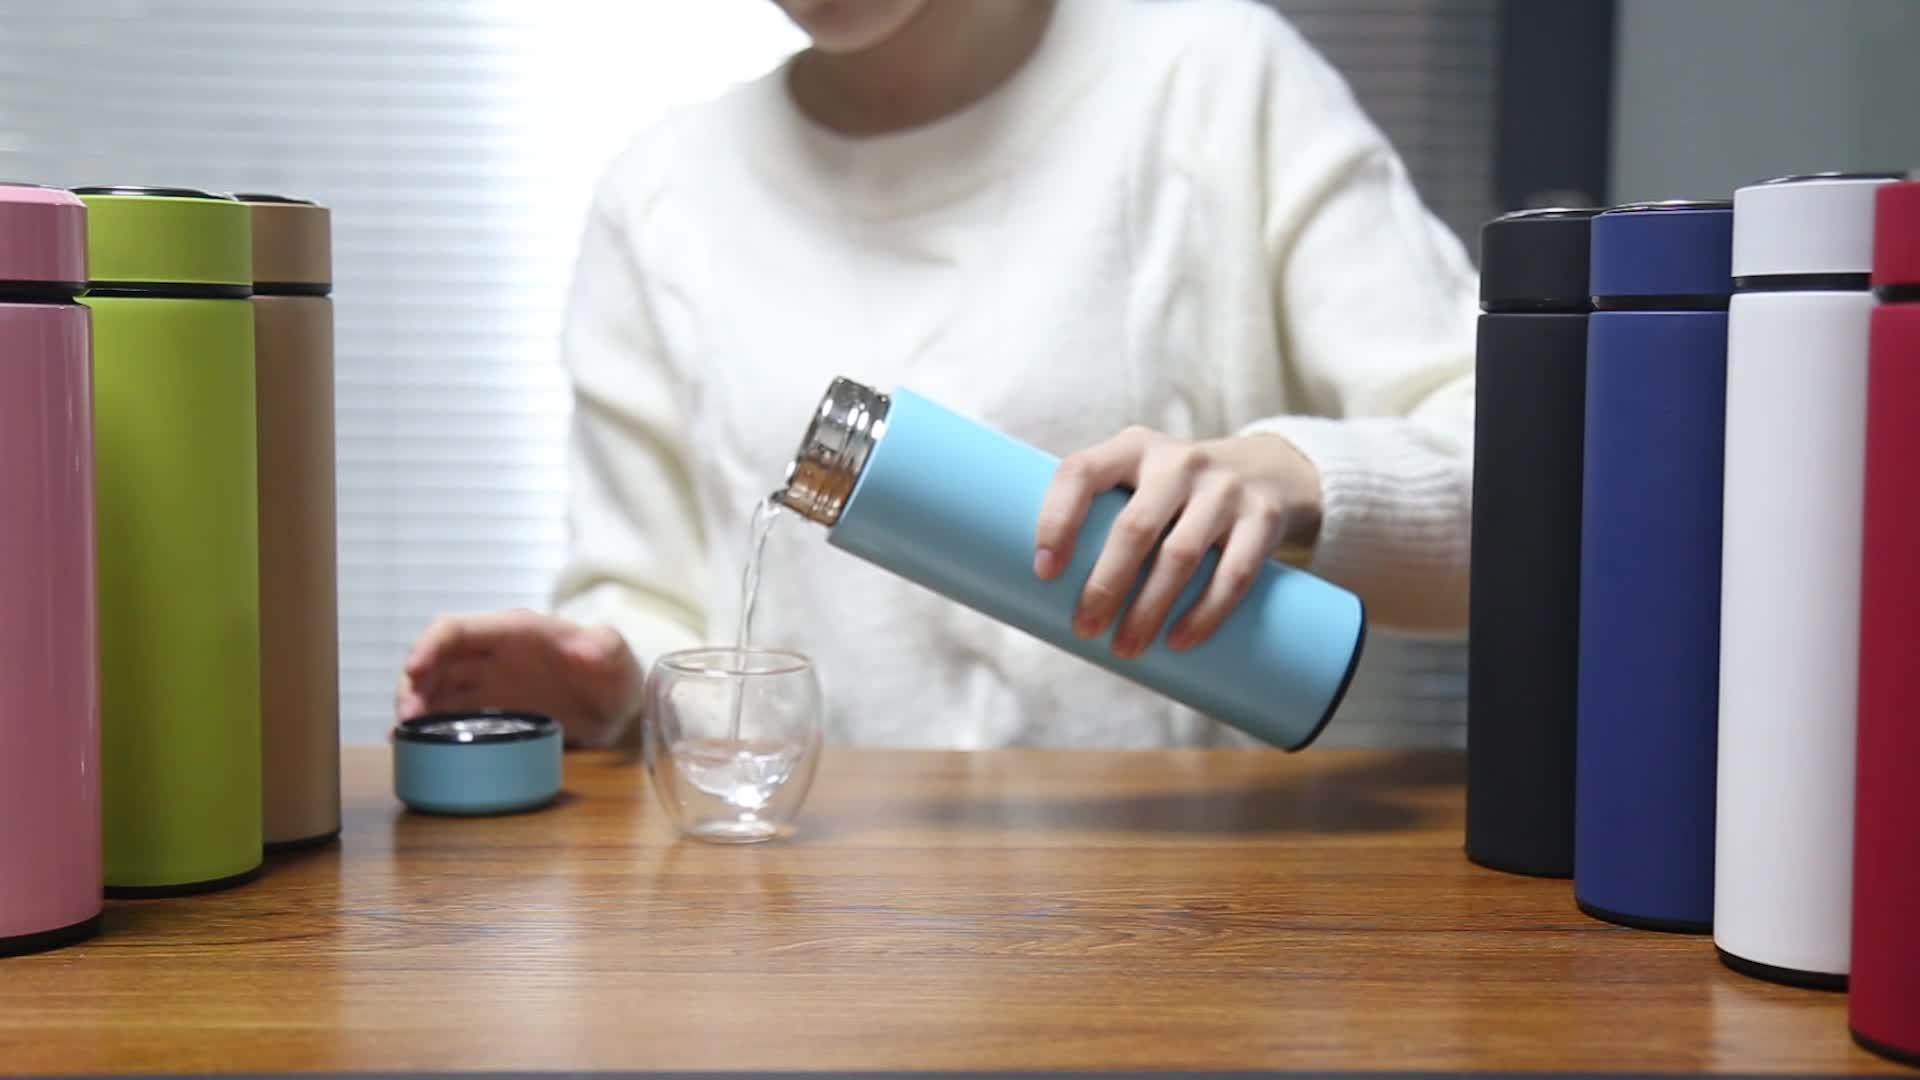 Healthy double wall ส่วนบุคคลฉนวนใหม่สูญญากาศน้ำดื่ม travel reusable ขวดสแตนเลส